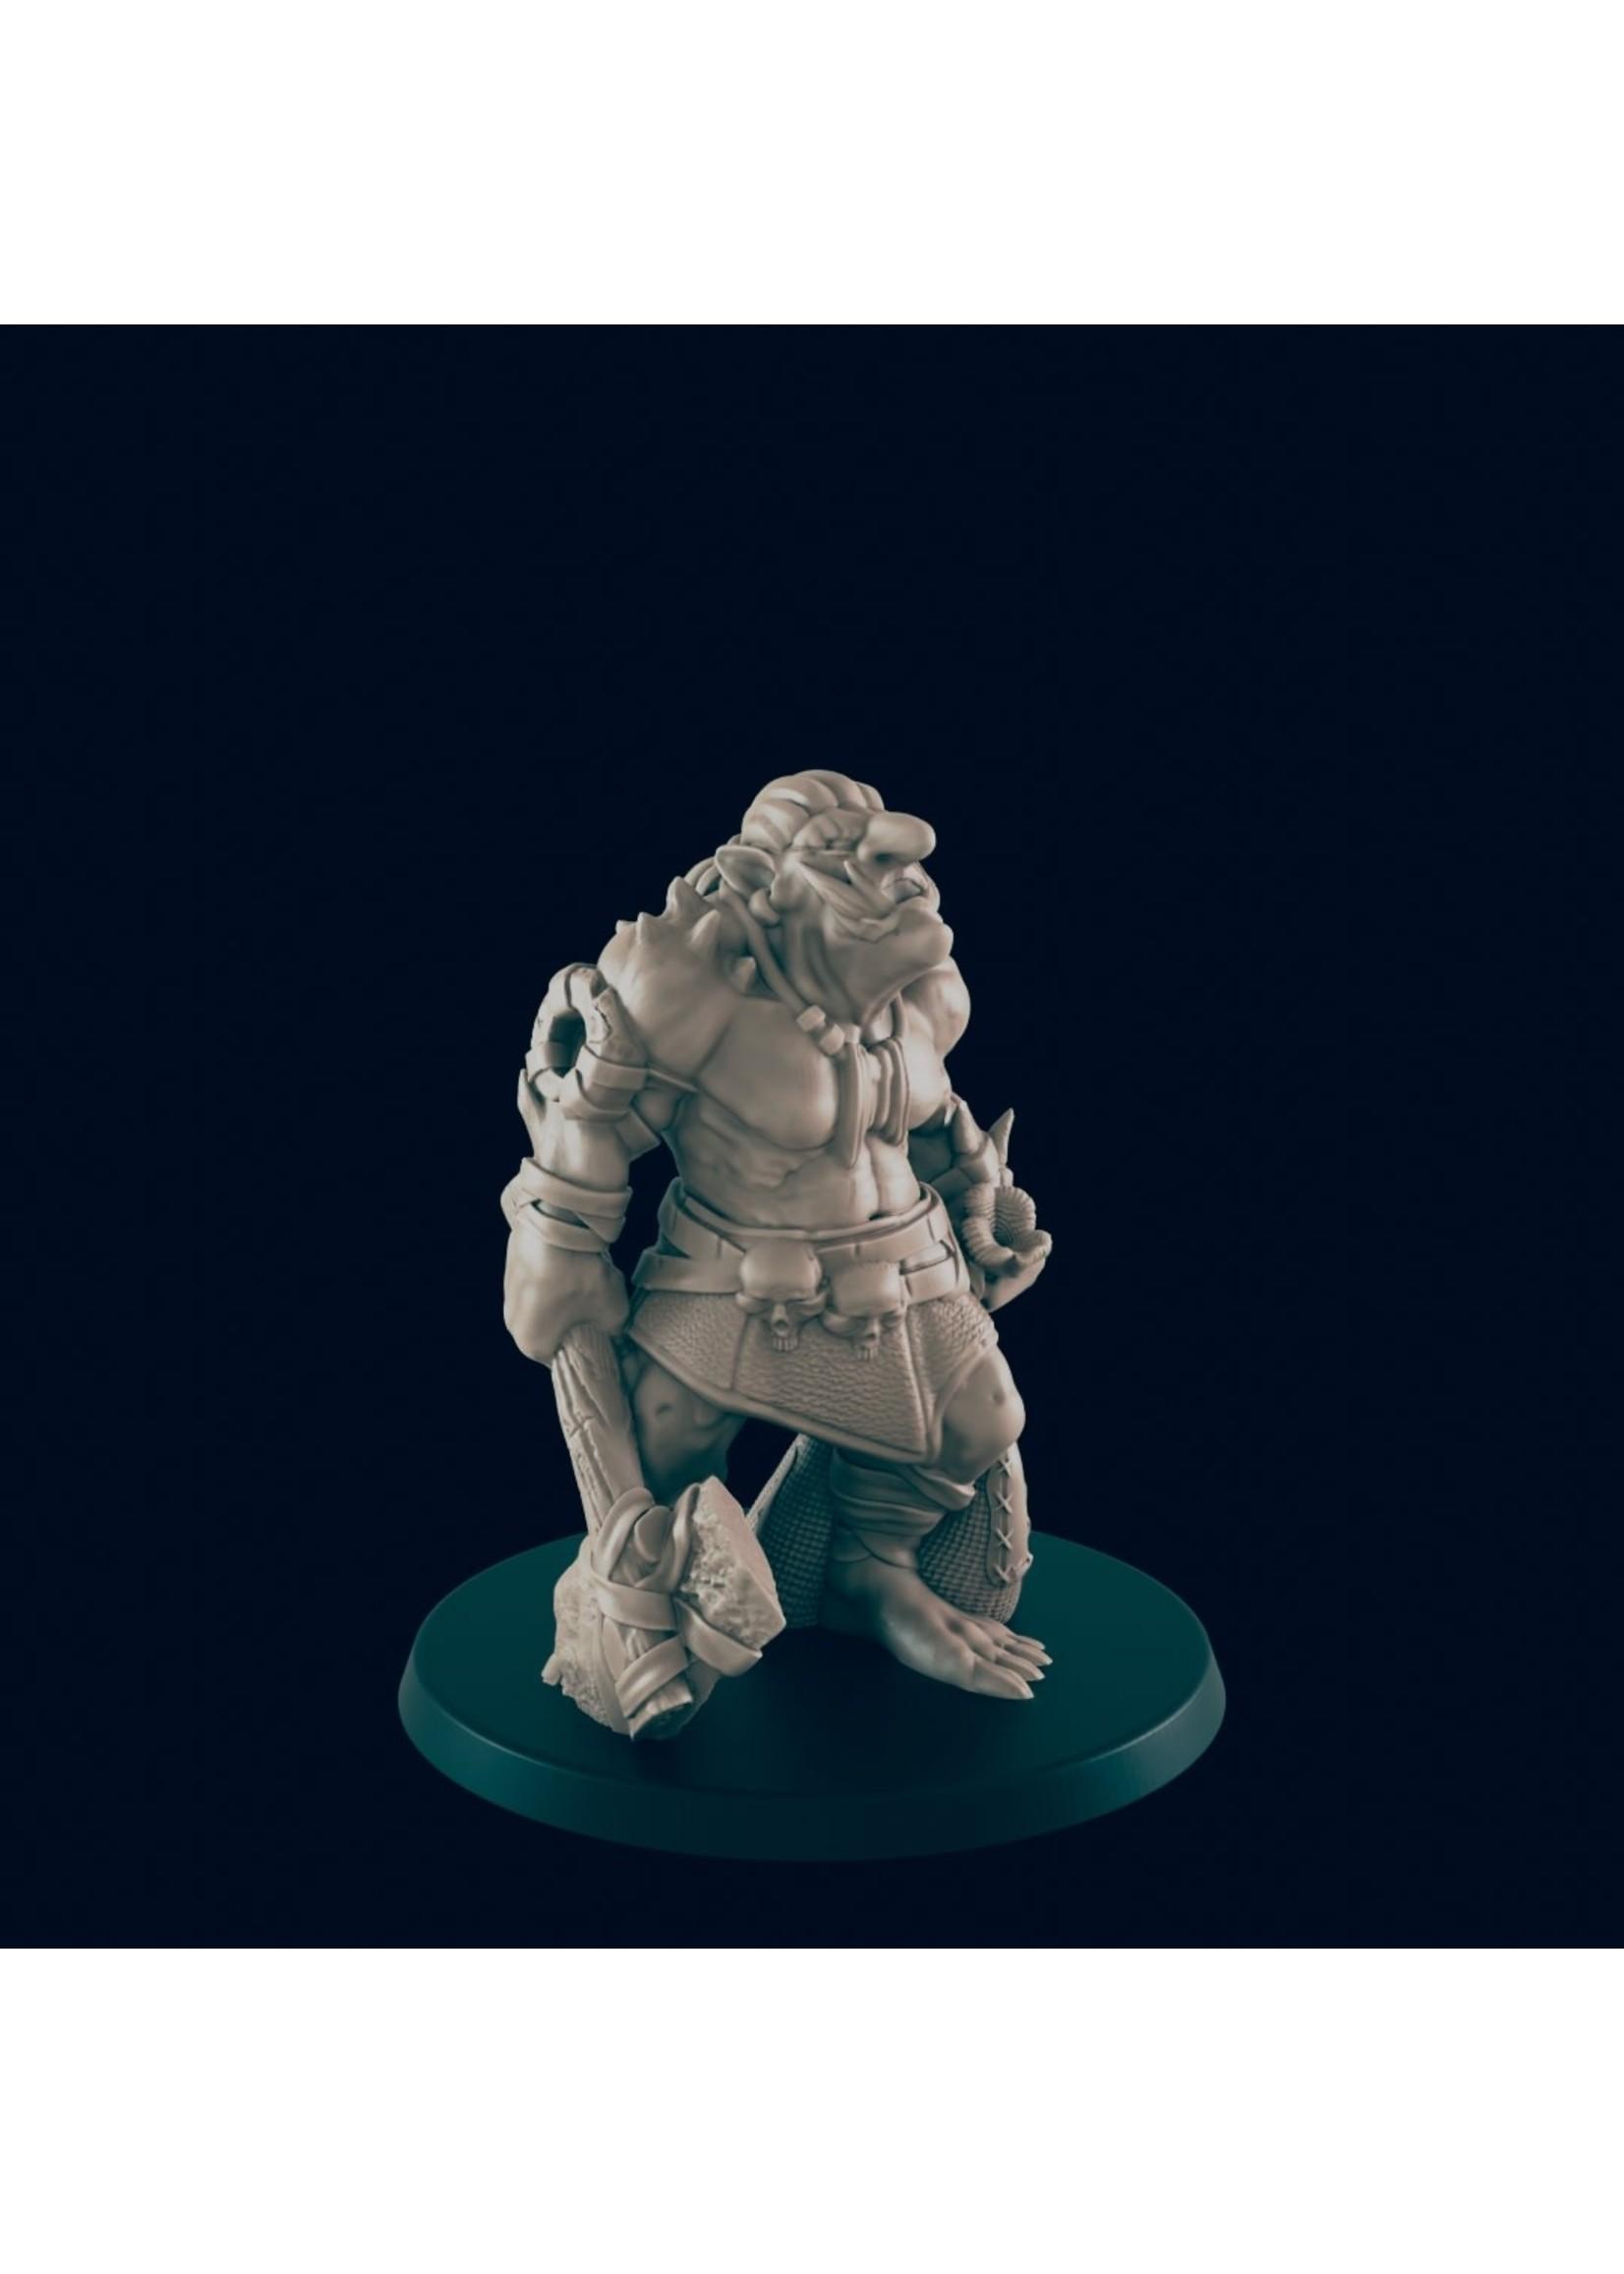 3D Printed Miniature - Troll B - Dungeons & Dragons - Beasts and Baddies KS